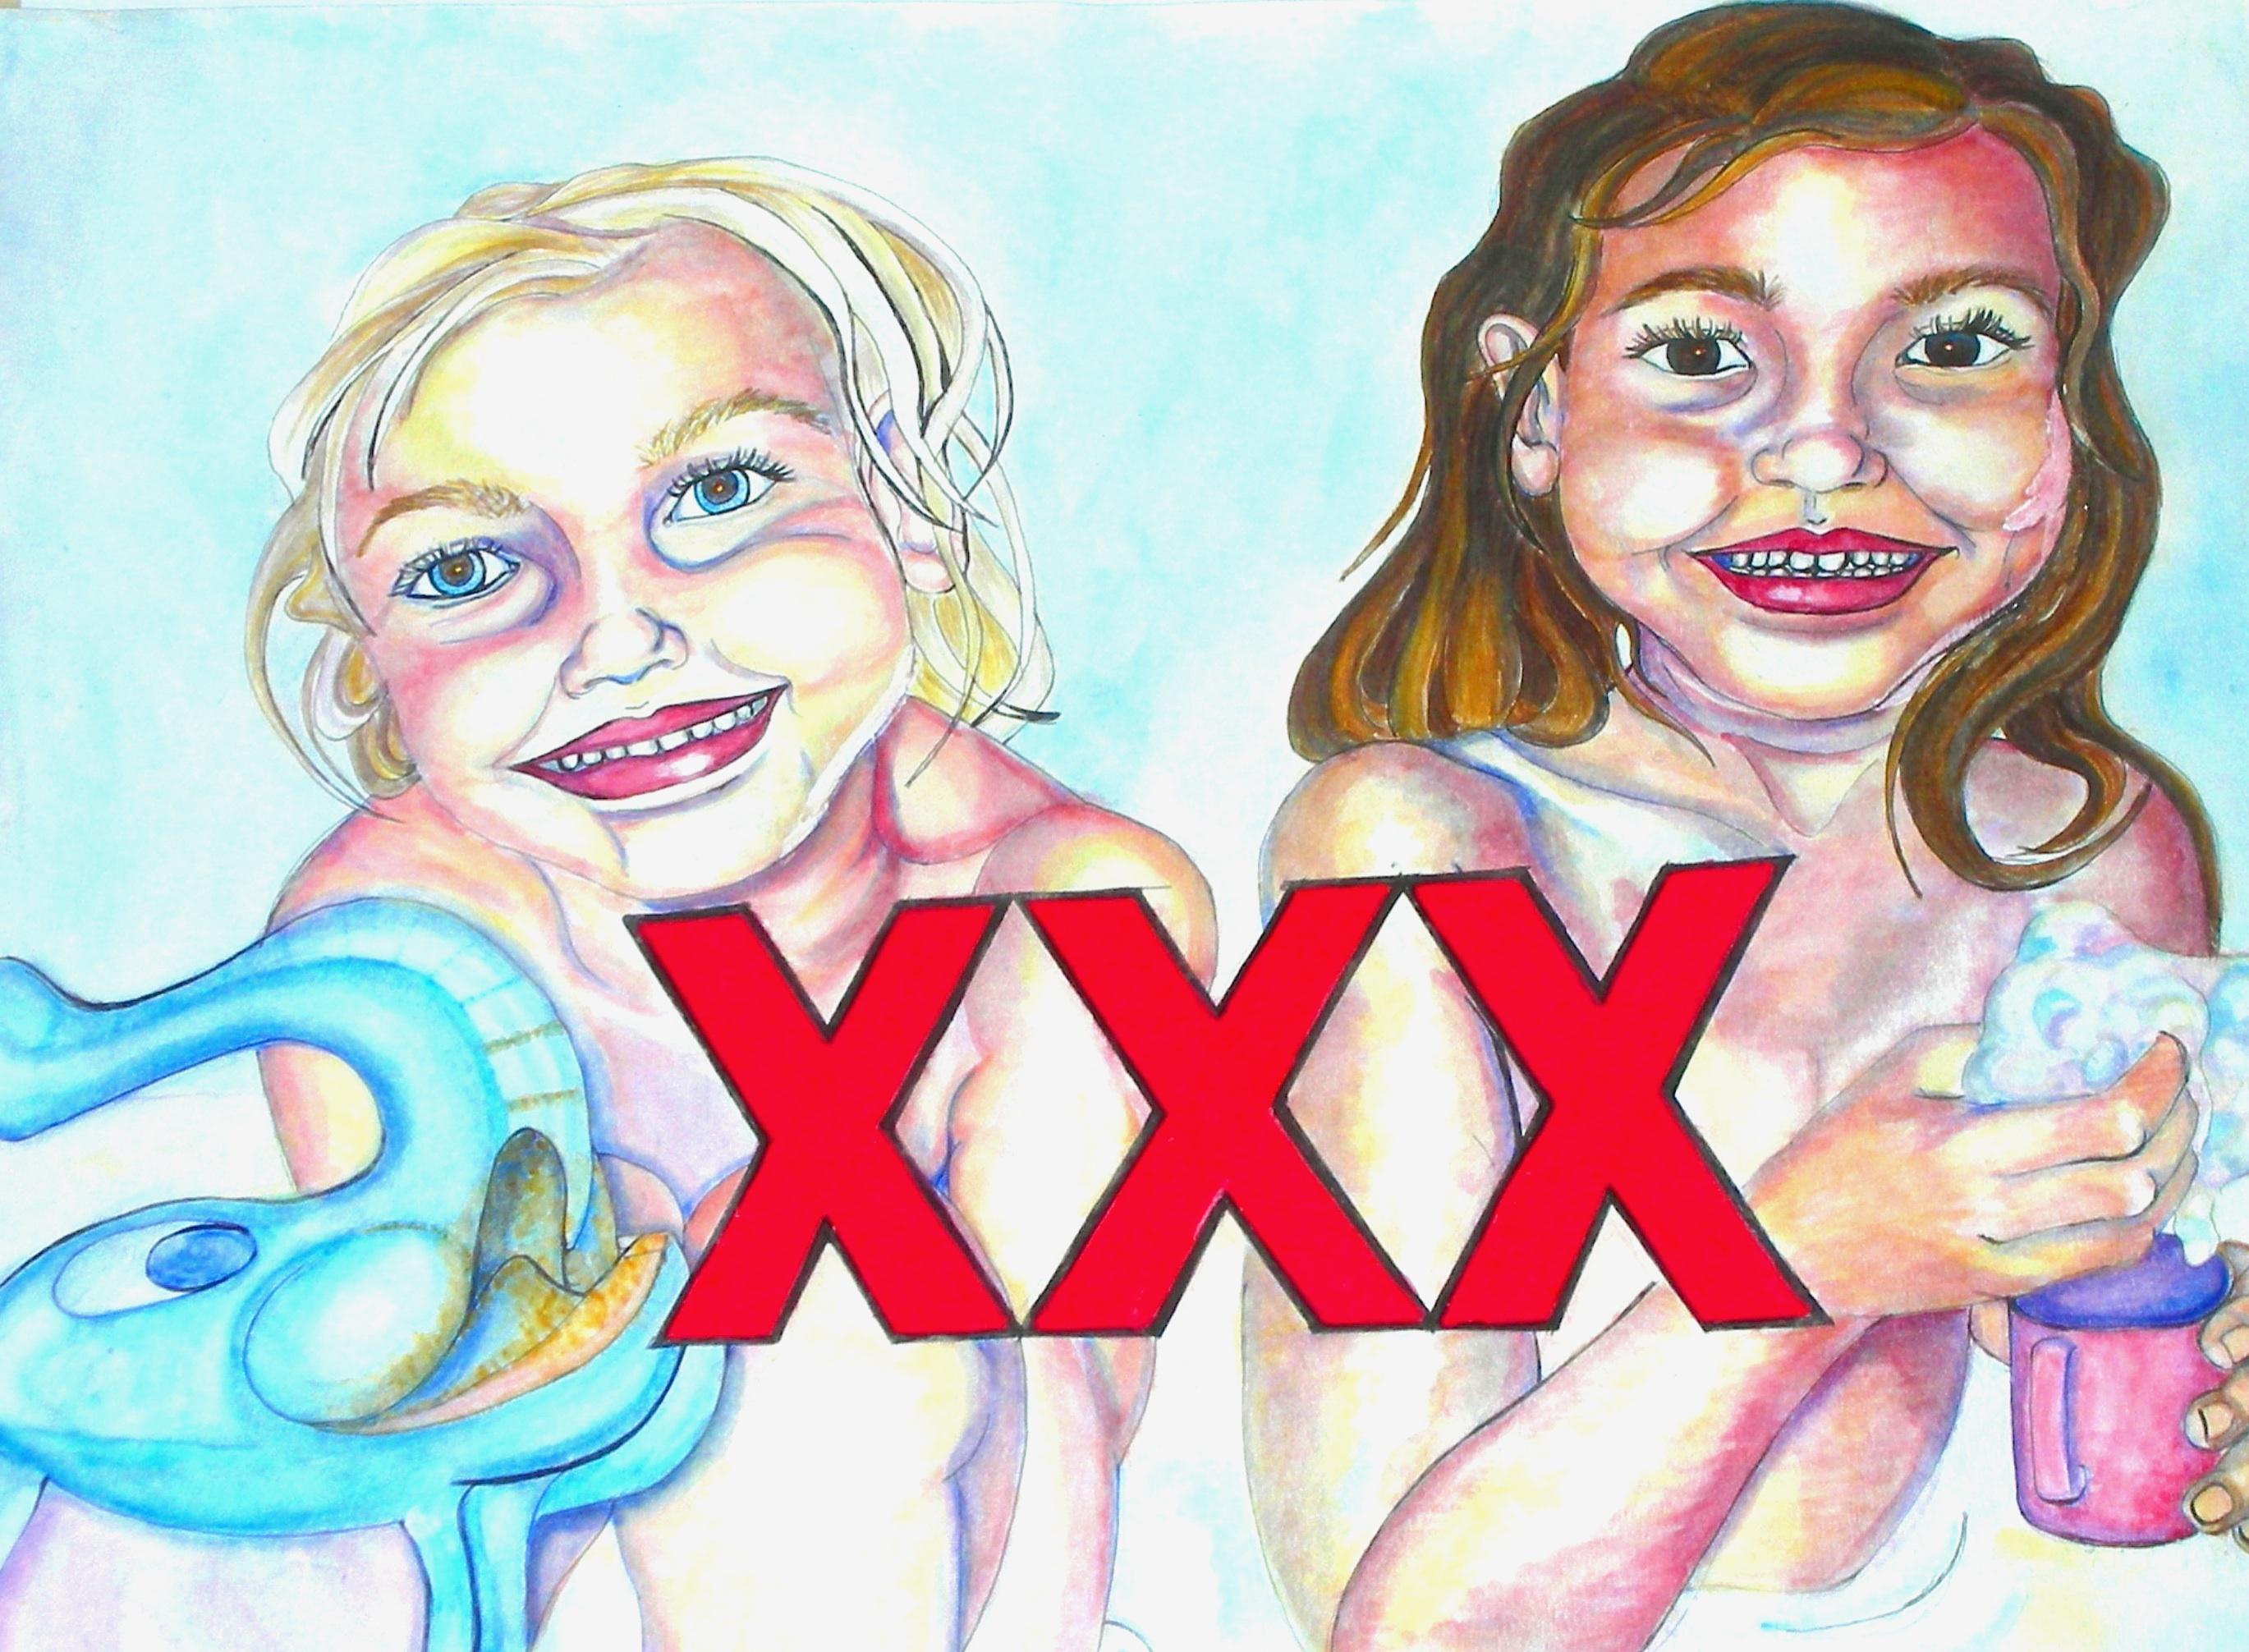 Xxx littles